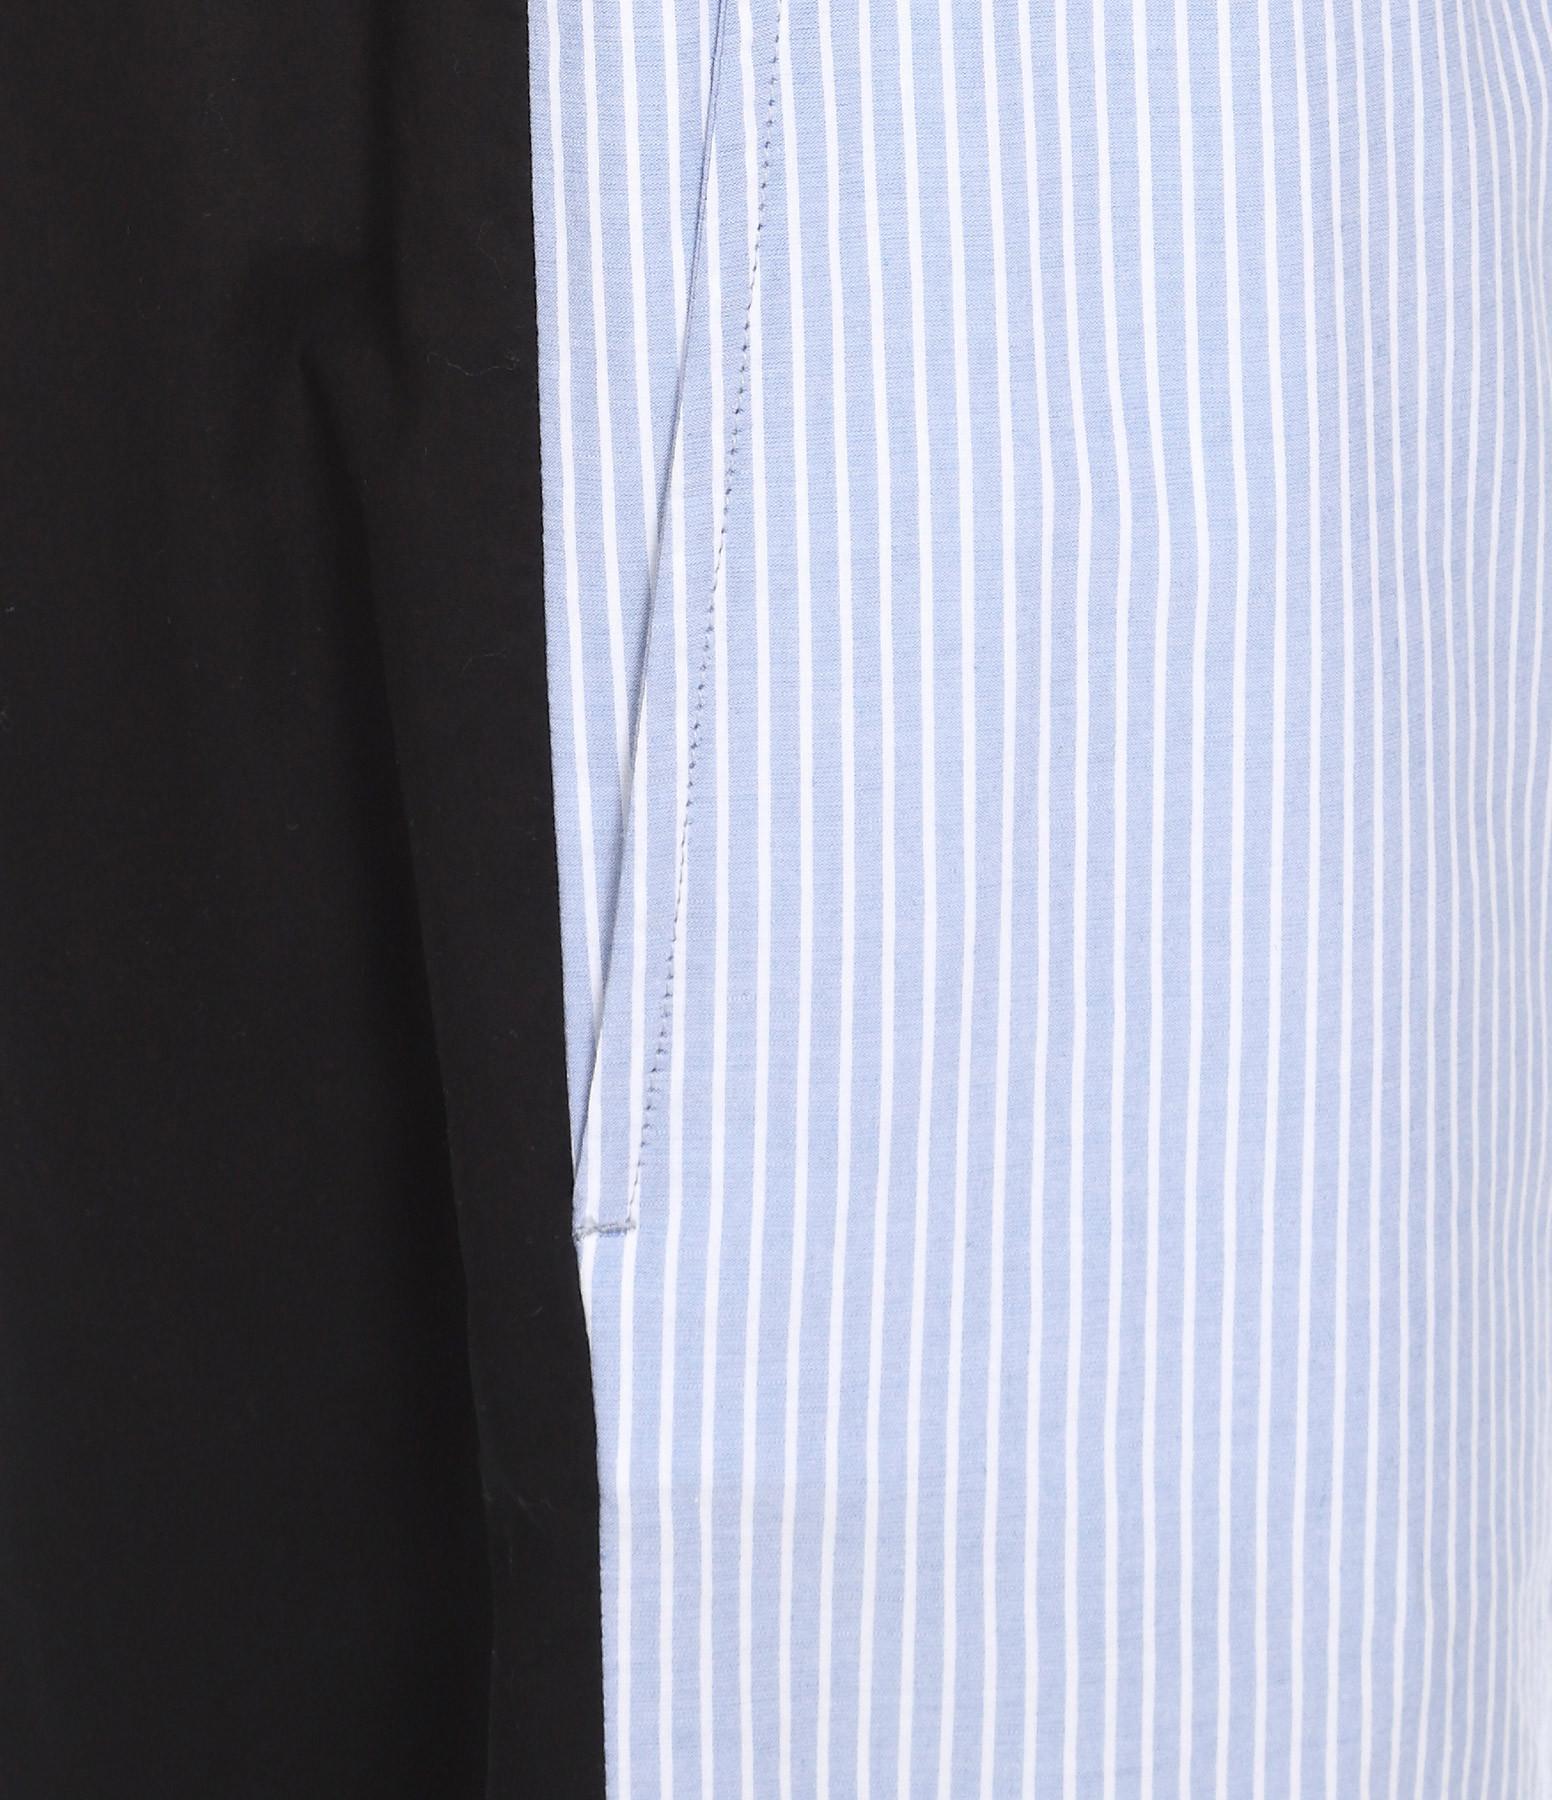 MM6 MAISON MARGIELA - Pantalon Elastiqué Bleu Noir